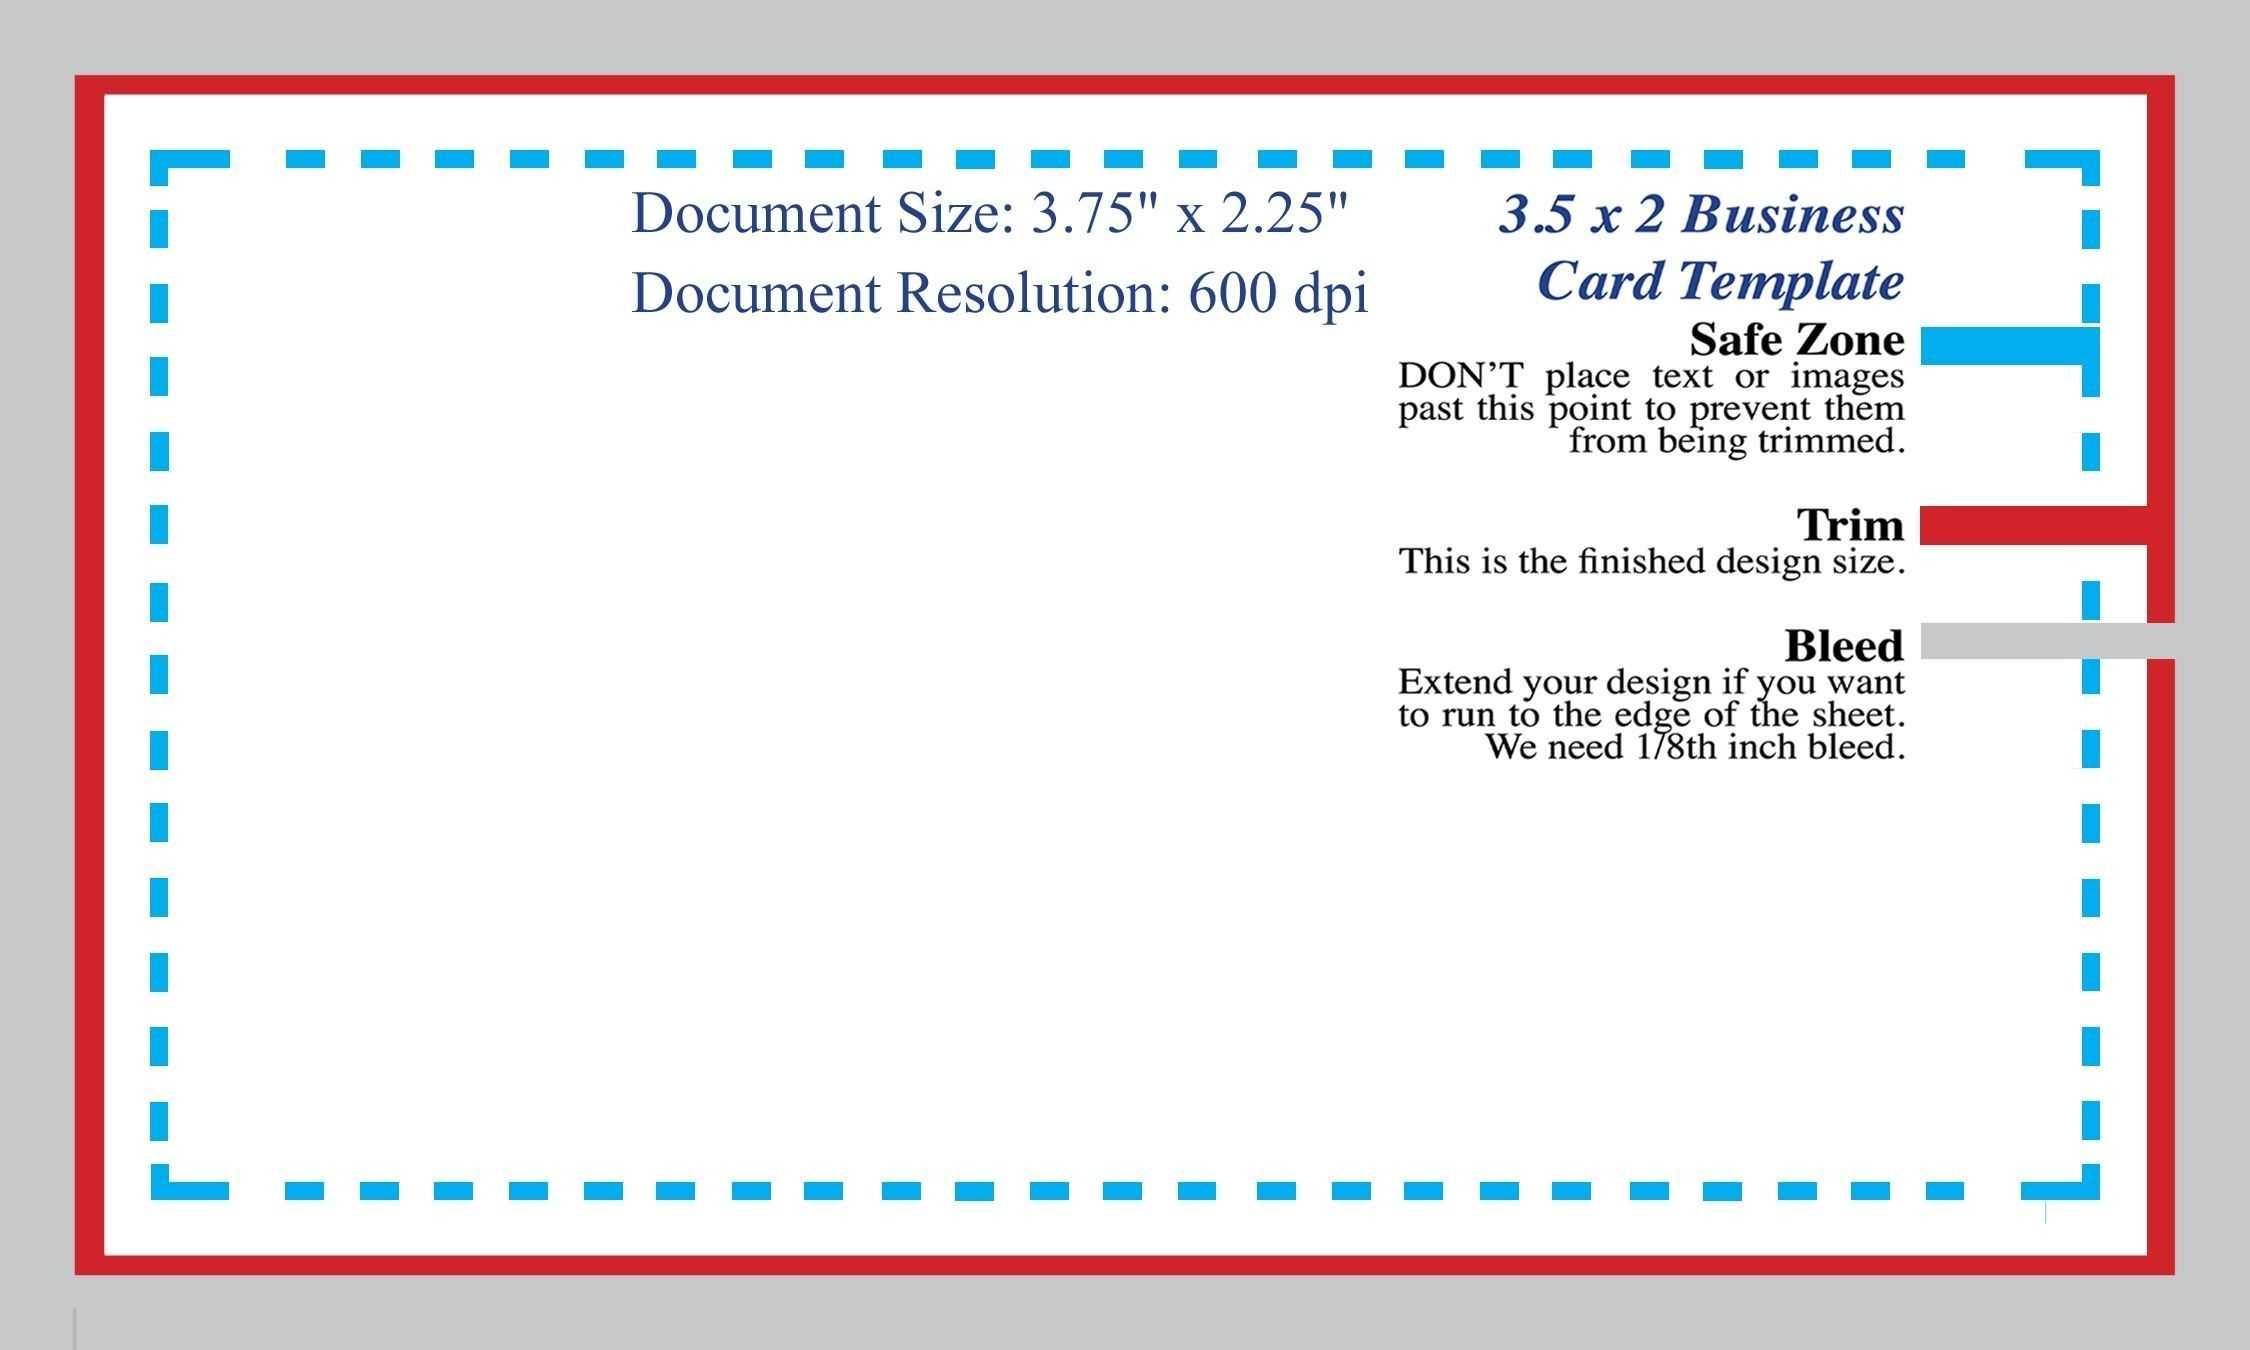 Standard Business Card Blank Template Photoshop Template Intended For Blank Business Card Template Photoshop